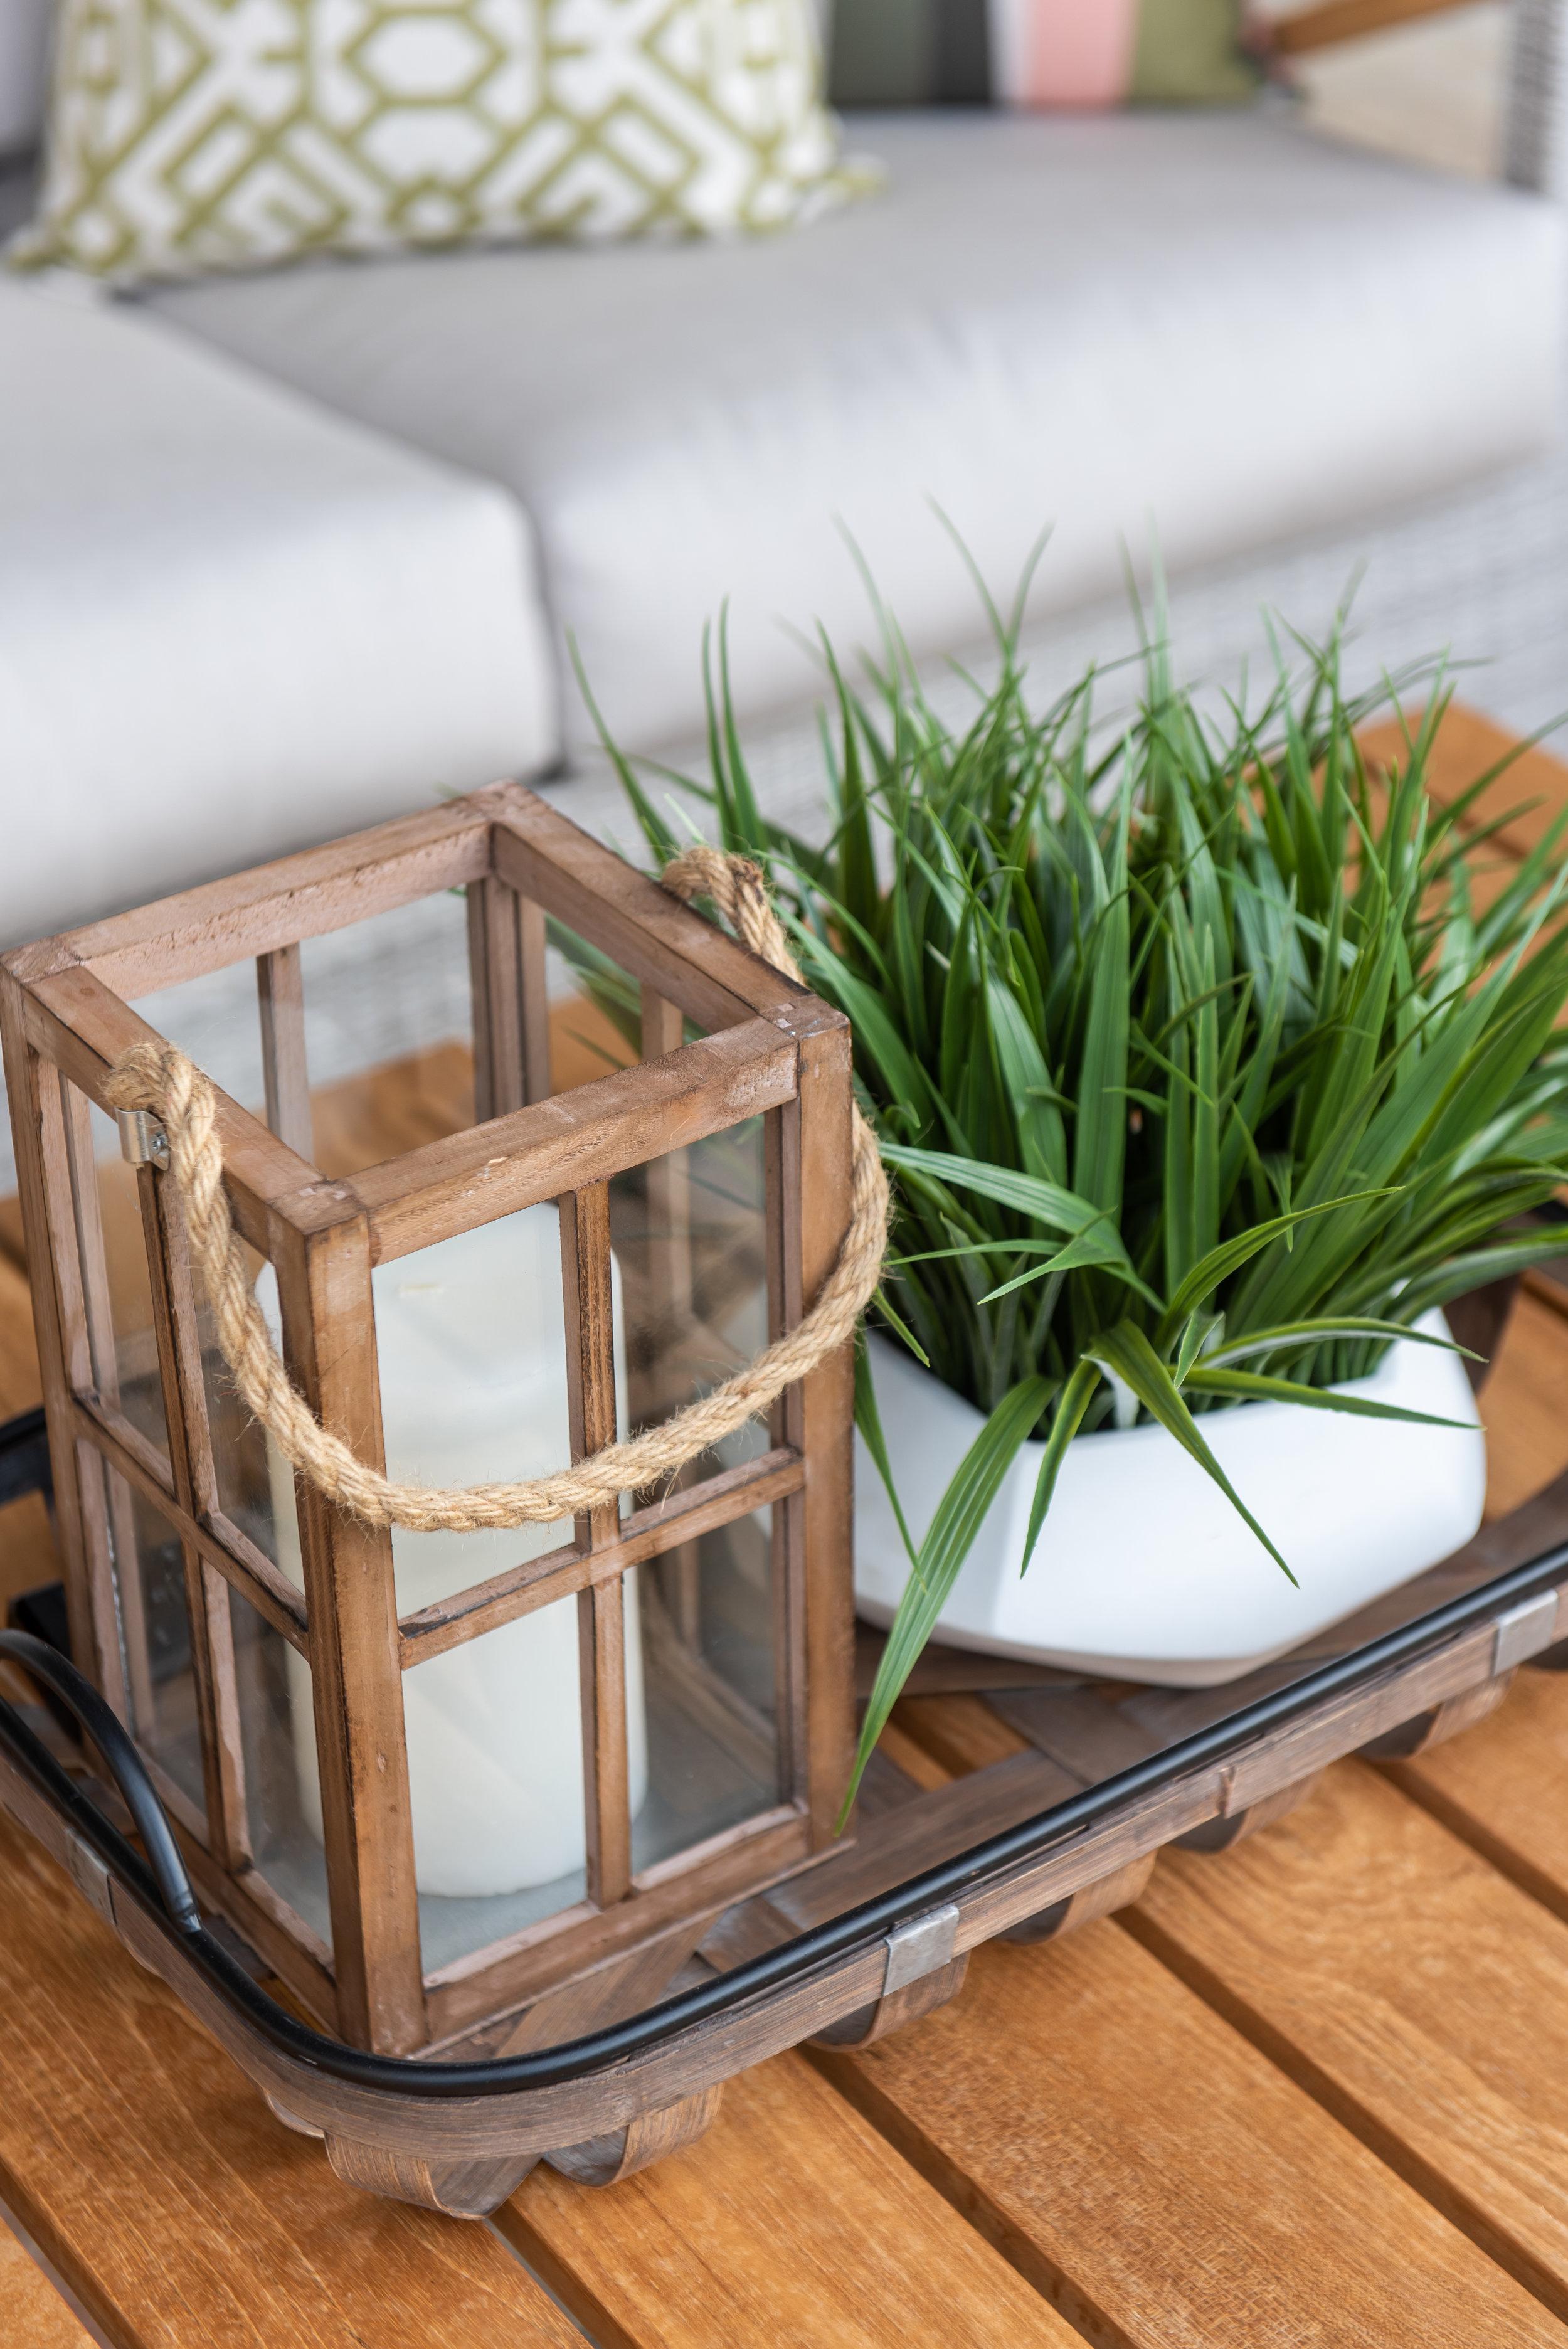 Backyard +patio +outdoor +plant +coffeetable.jpg